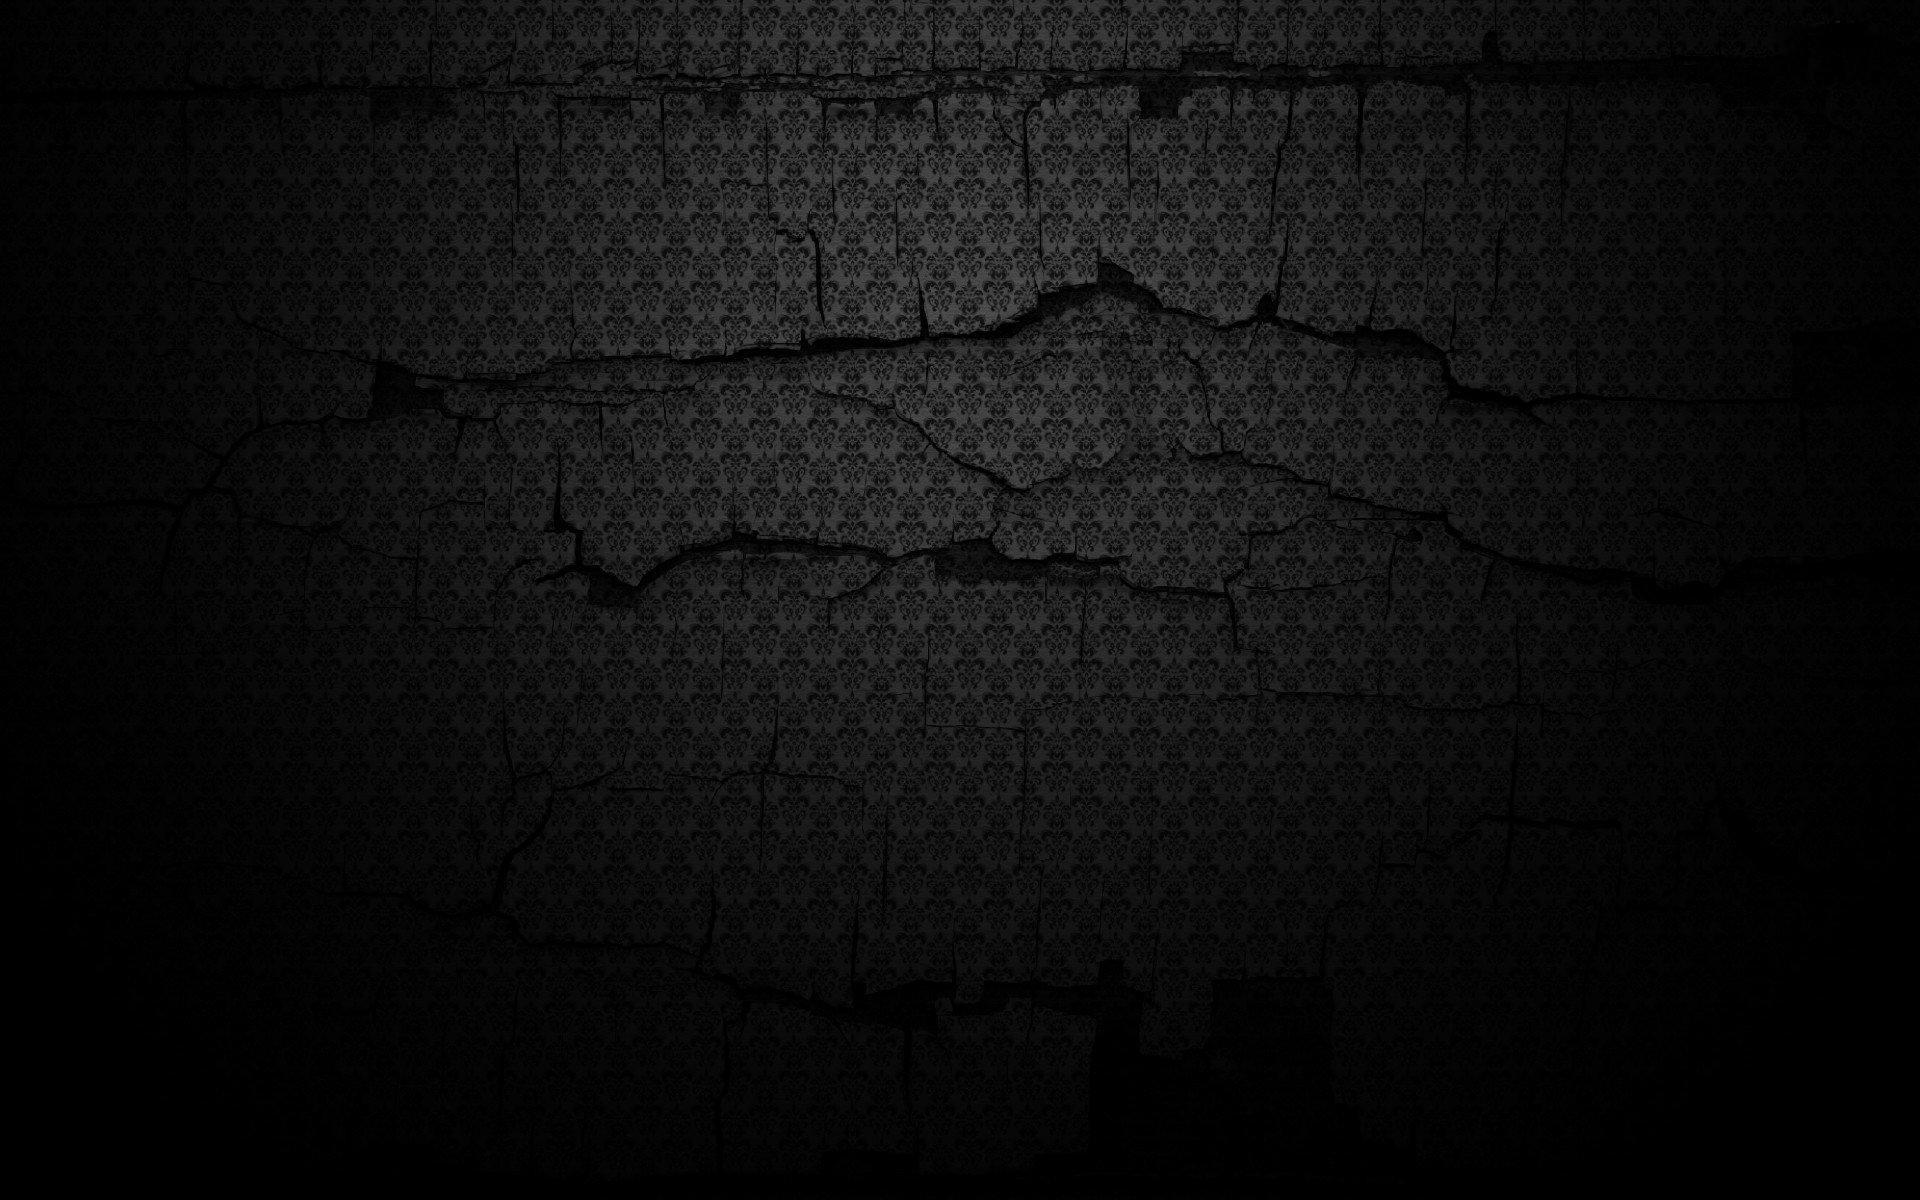 wallpaper.wiki-Free-crack-wall-photos-PIC-WPD0011867